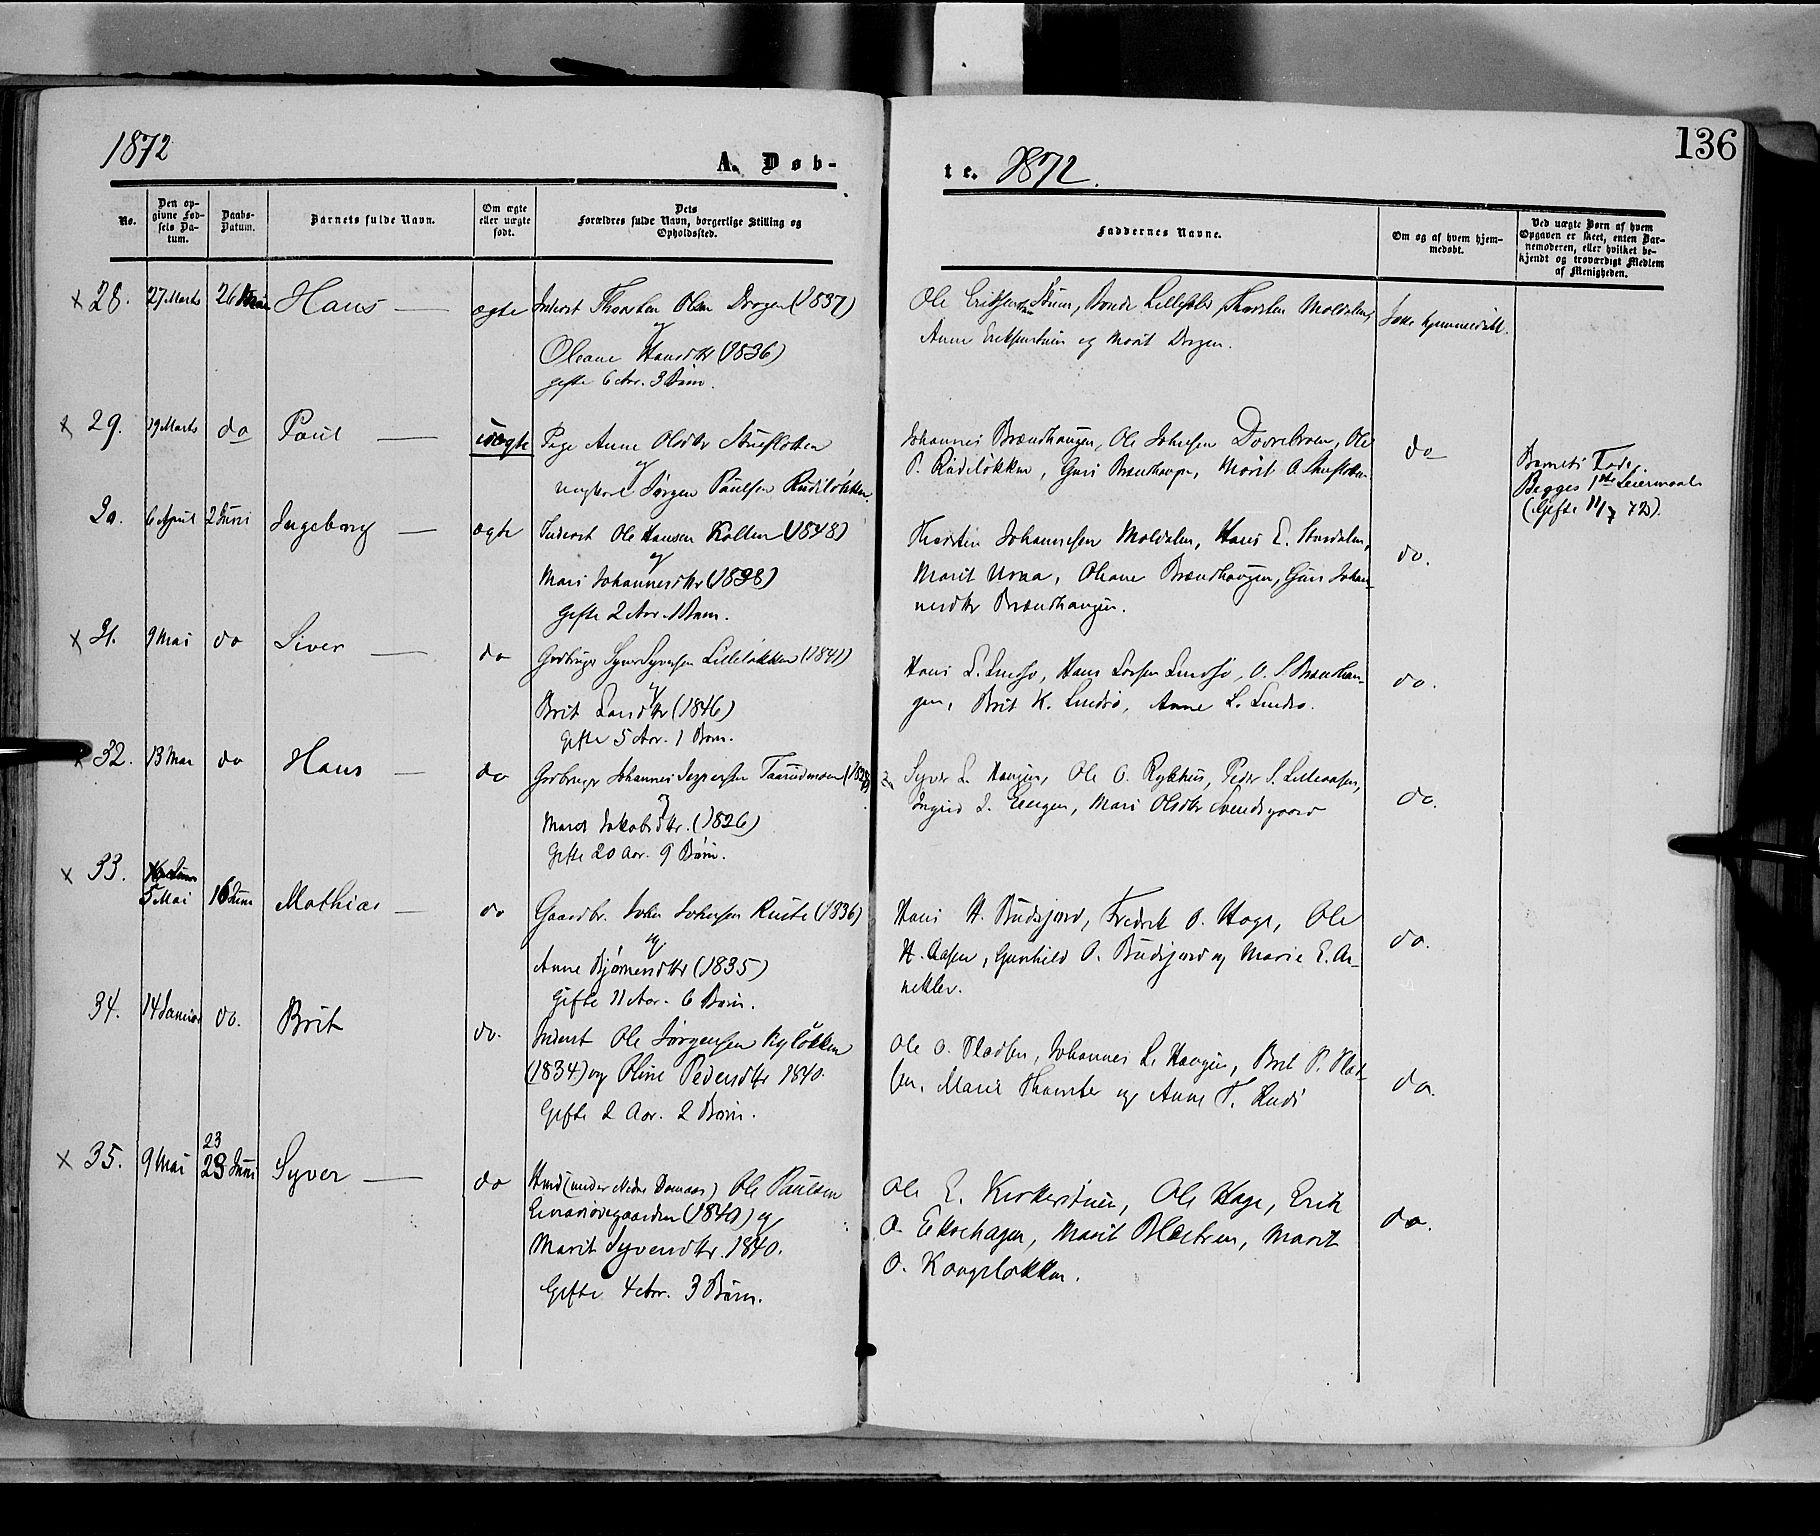 SAH, Dovre prestekontor, Ministerialbok nr. 1, 1854-1878, s. 136